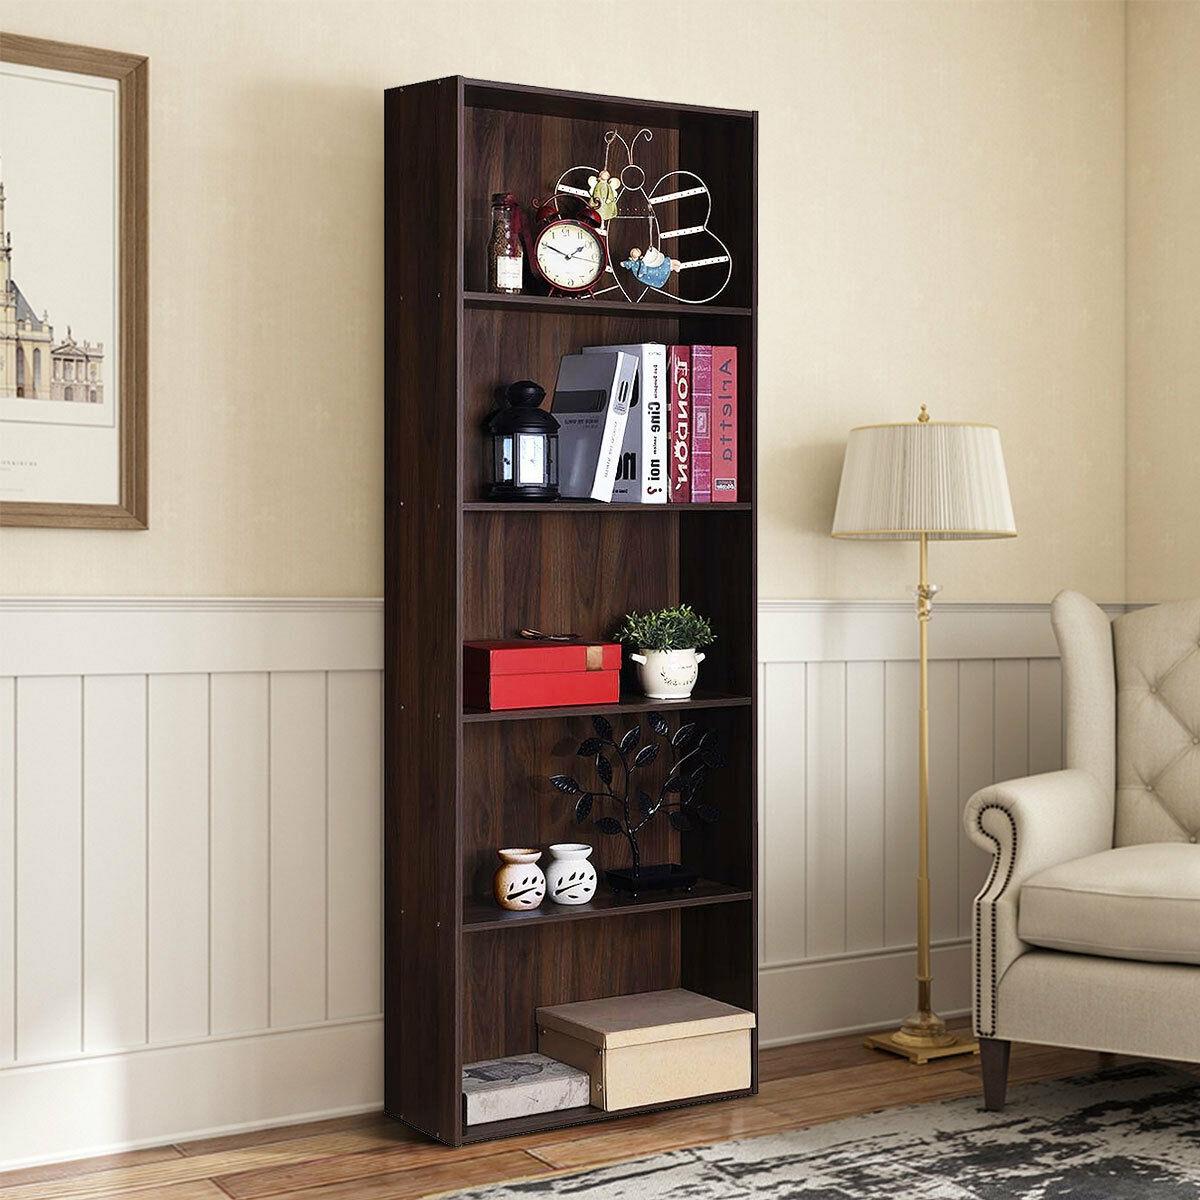 5-Shelf Storage Bookcase Modern Multi-Functional Display Cabinet Furniture